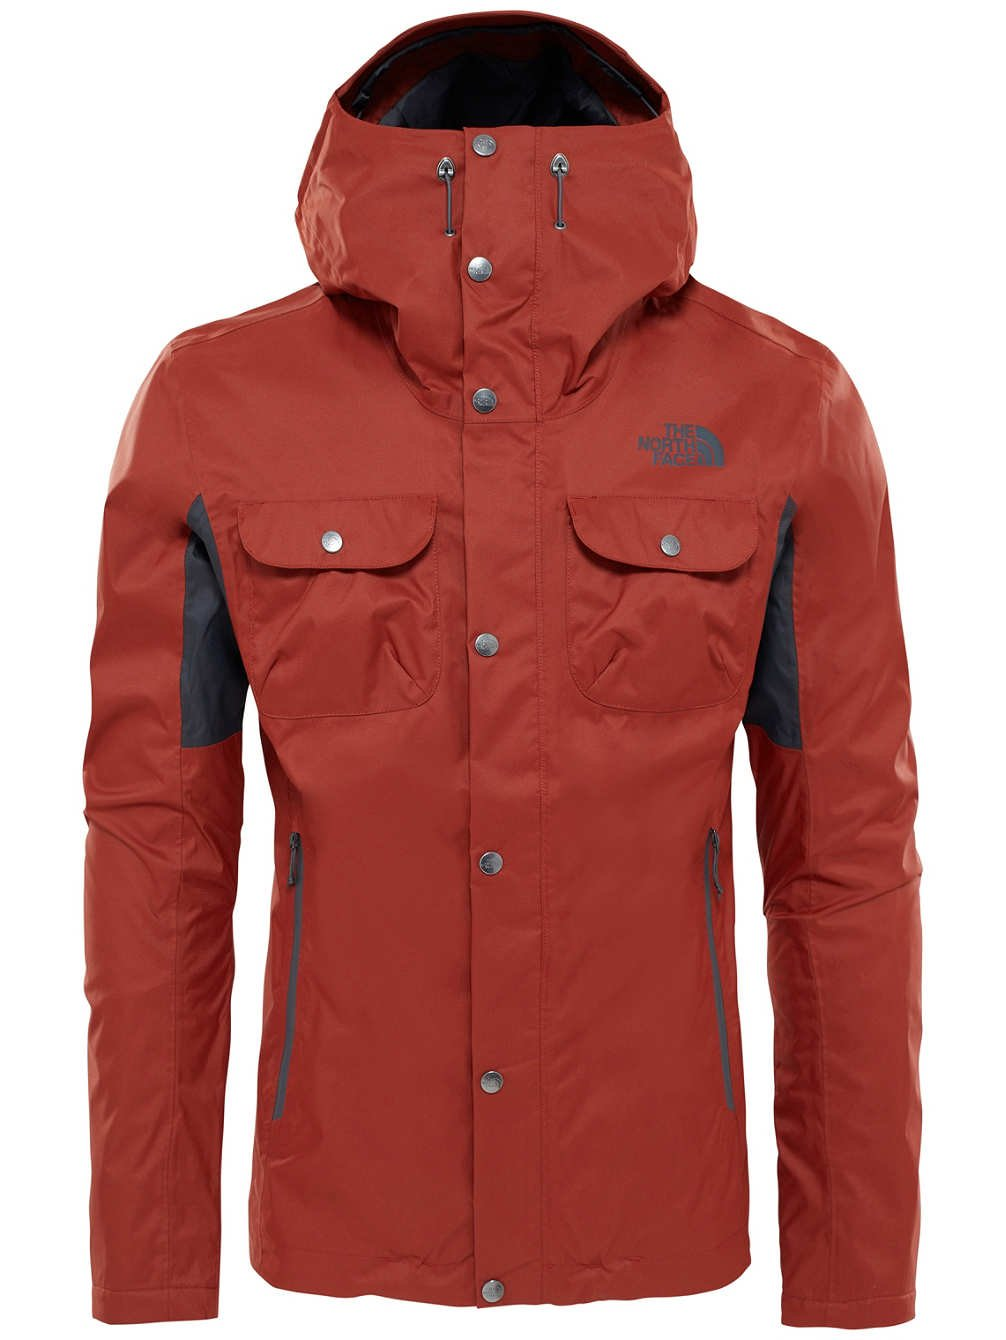 6c543d2de125 The North Face Men s Arrano Outdoor Jacket  Amazon.co.uk  Sports   Outdoors